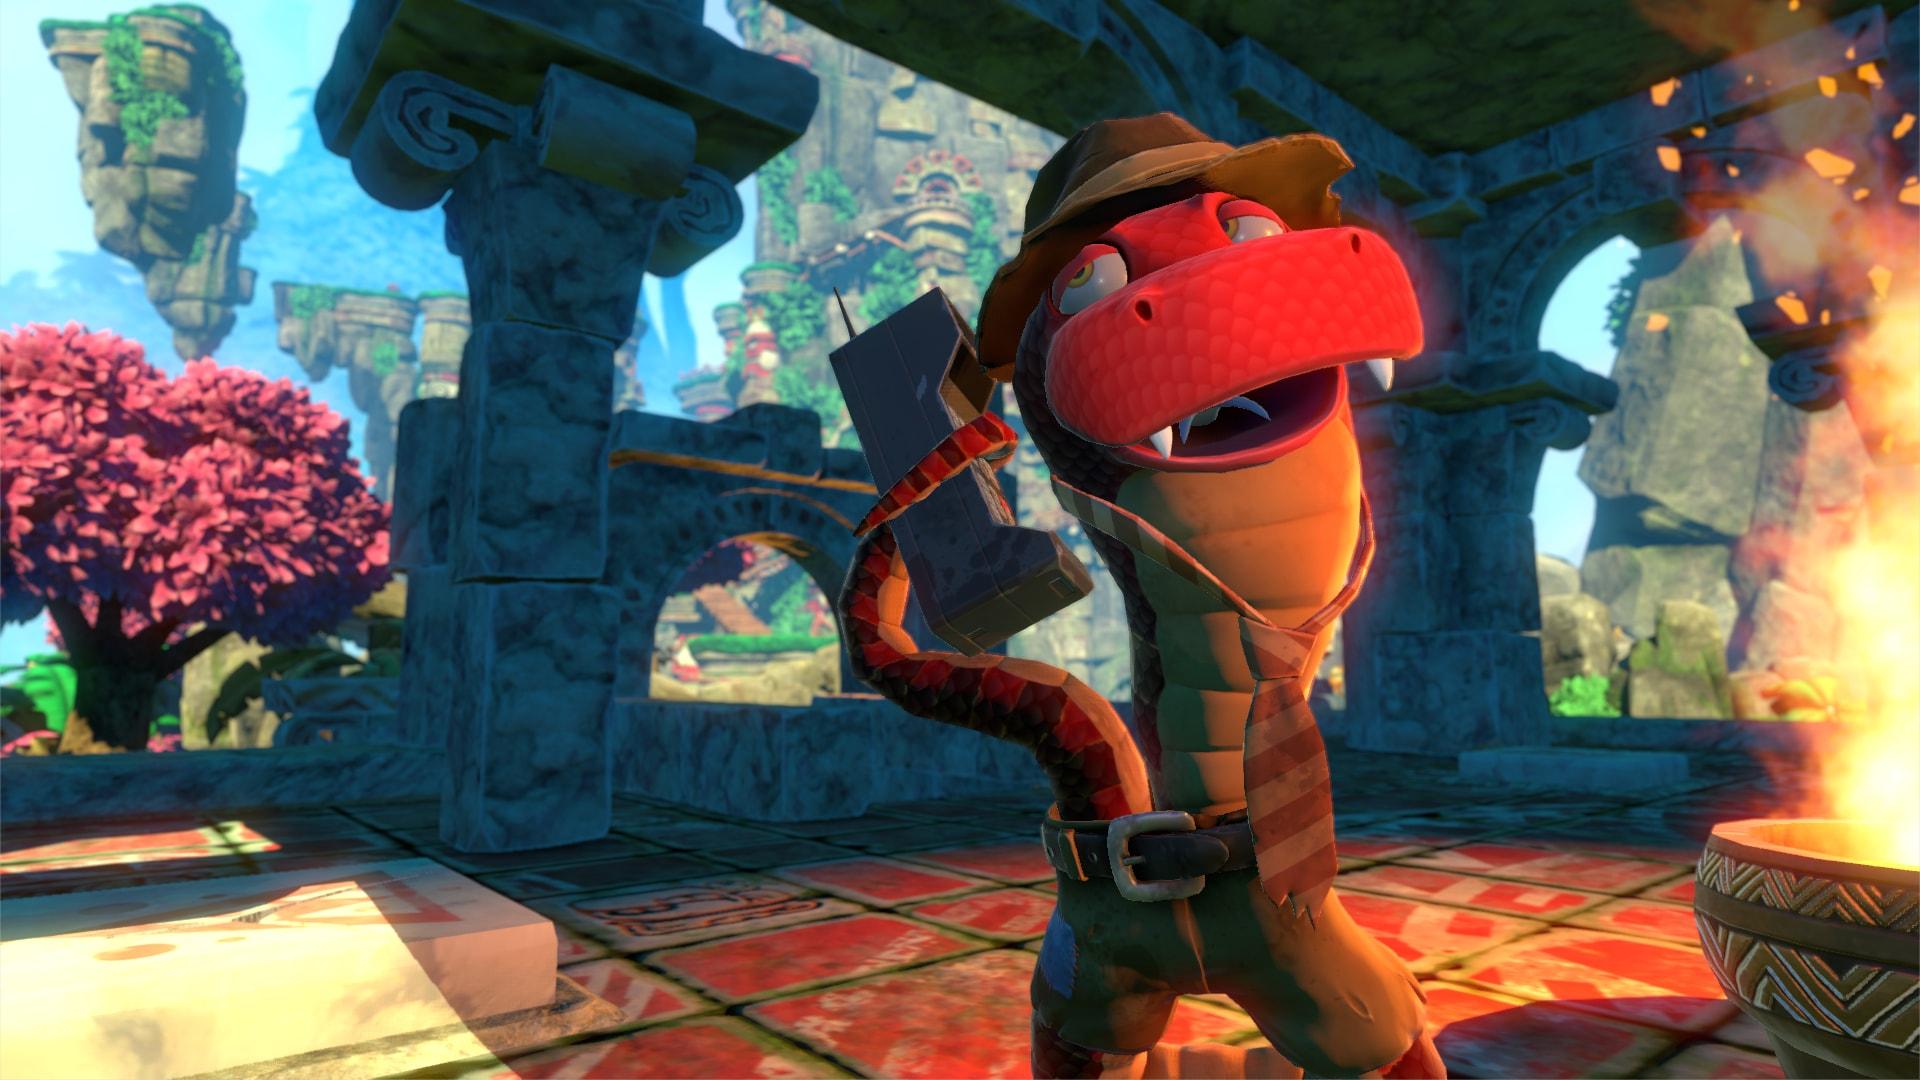 Yooka-Laylee oznamuje mega multiplayerové režimy 136746